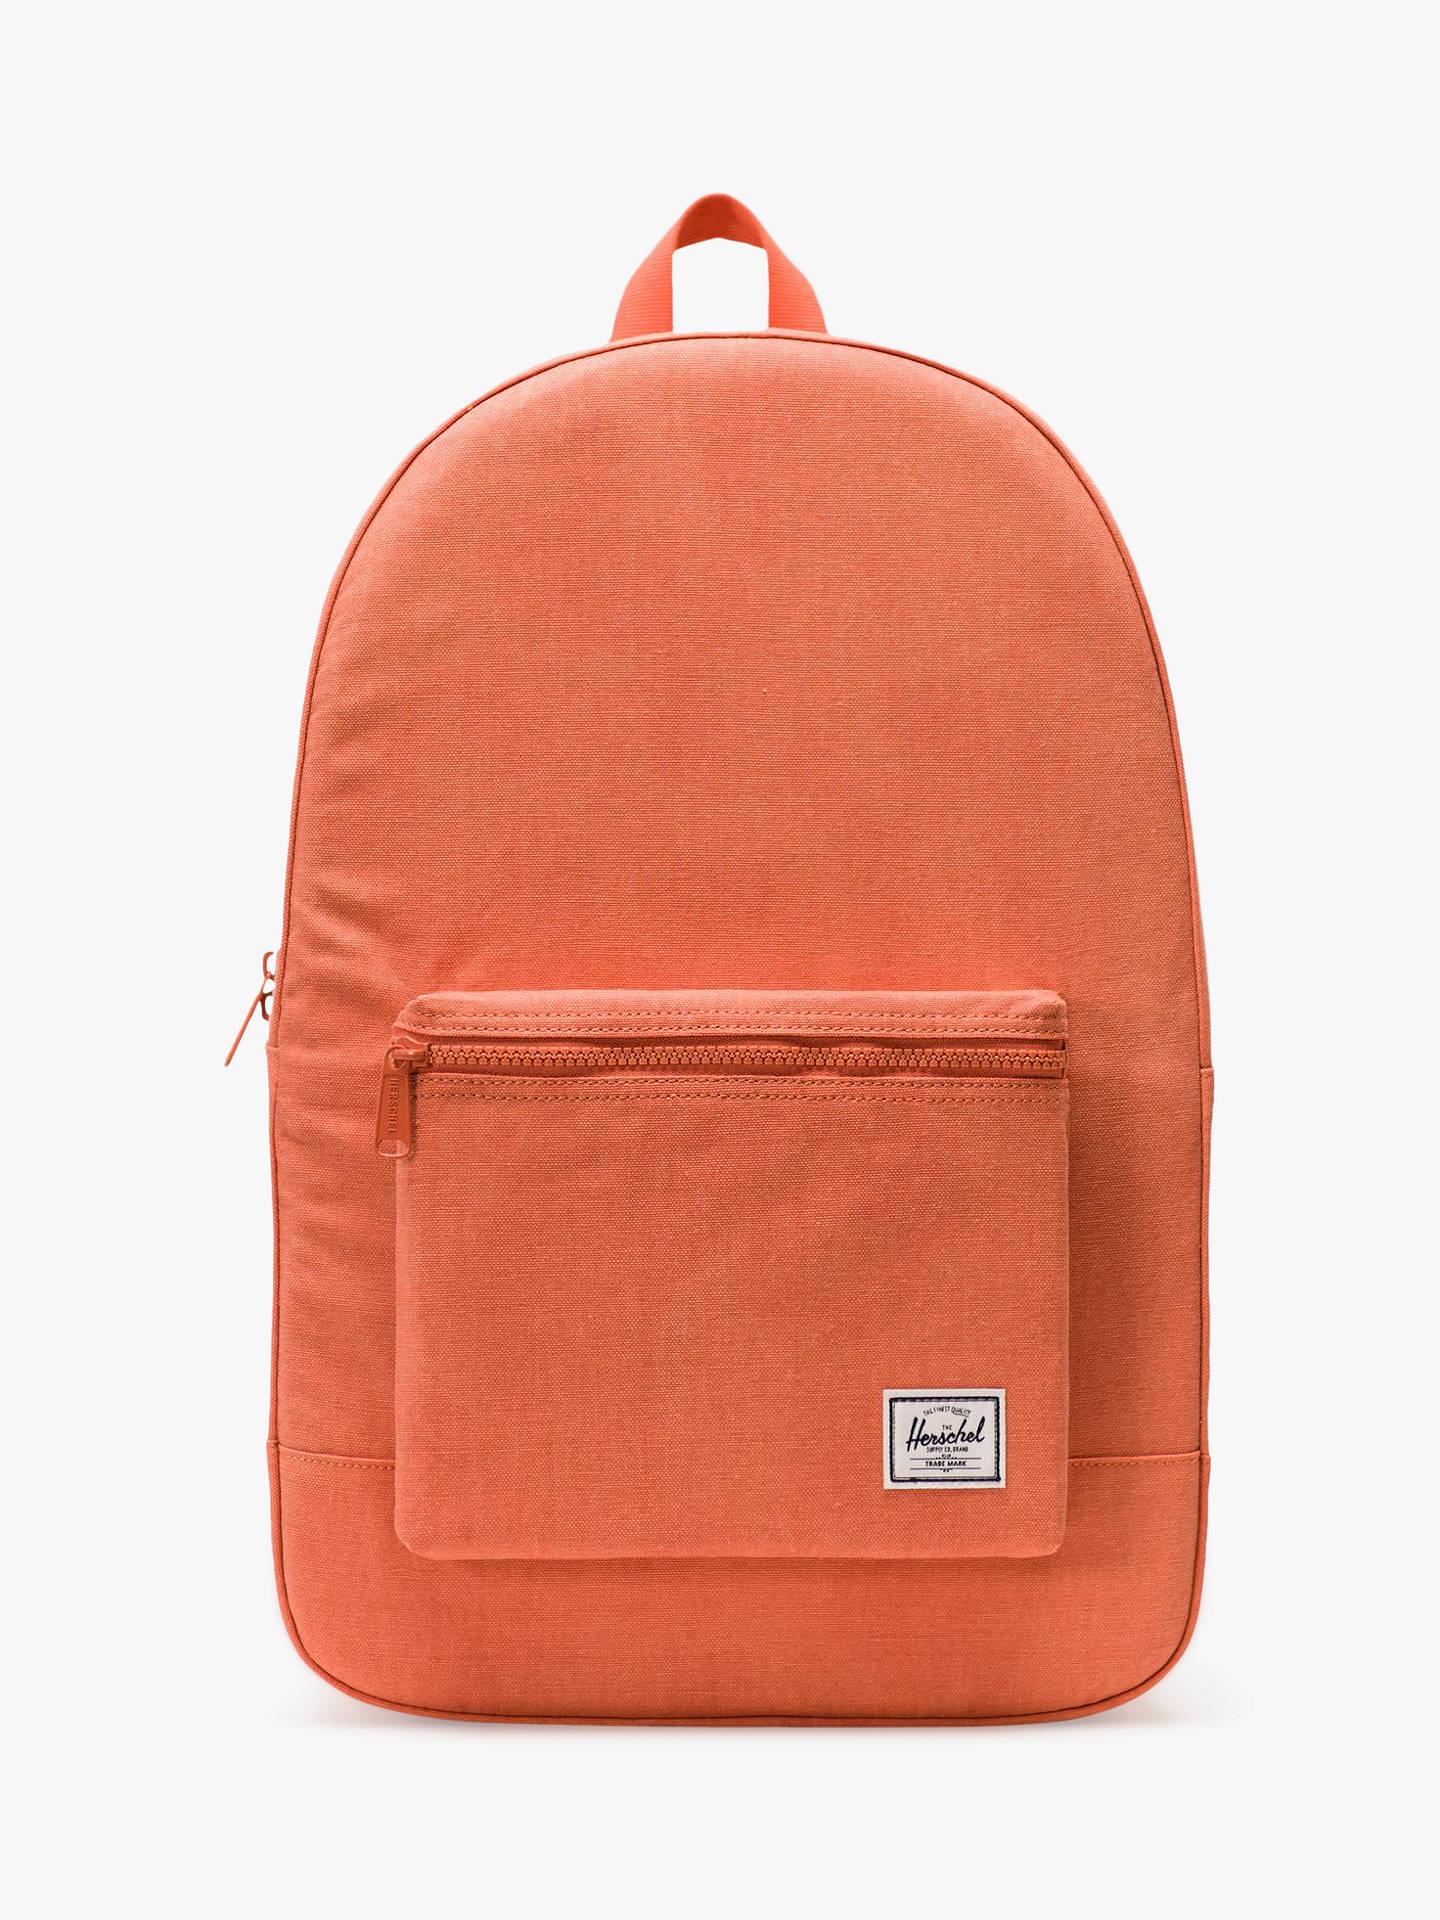 BuyHerschel Supply Co. Daypack 659ec5dfe8c90